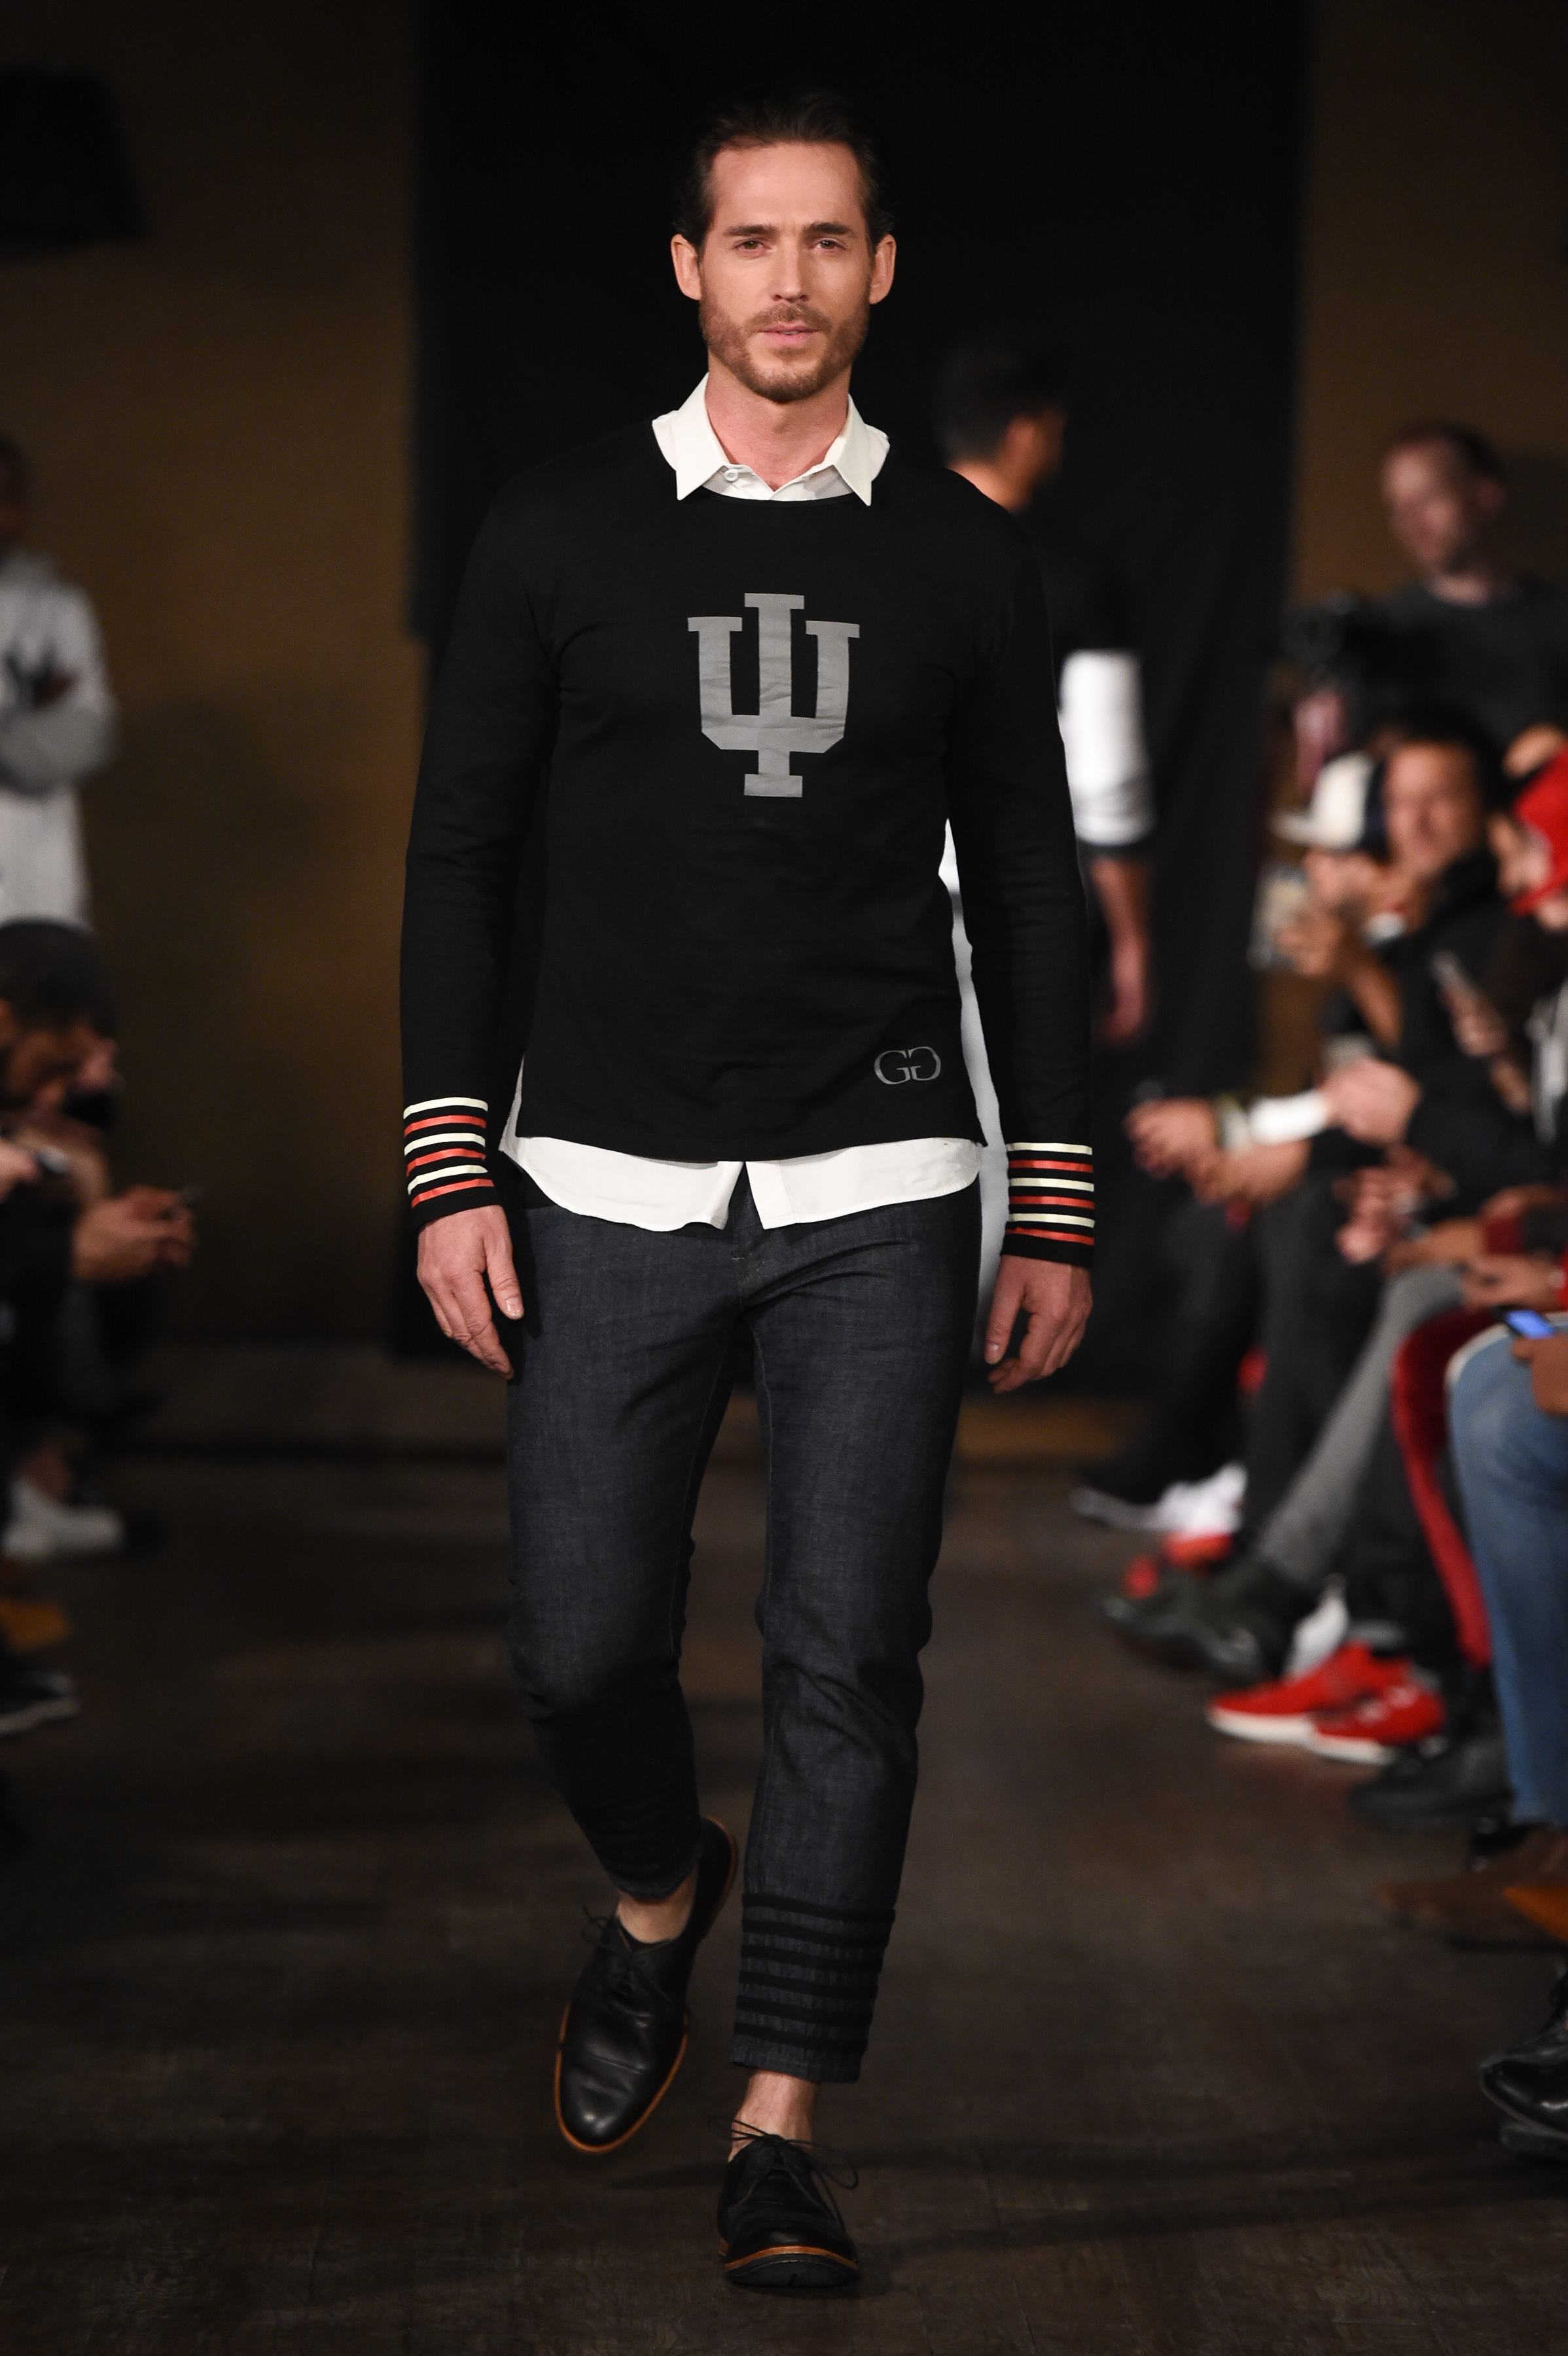 Grungy Gentleman x Indiana University 4.jpg